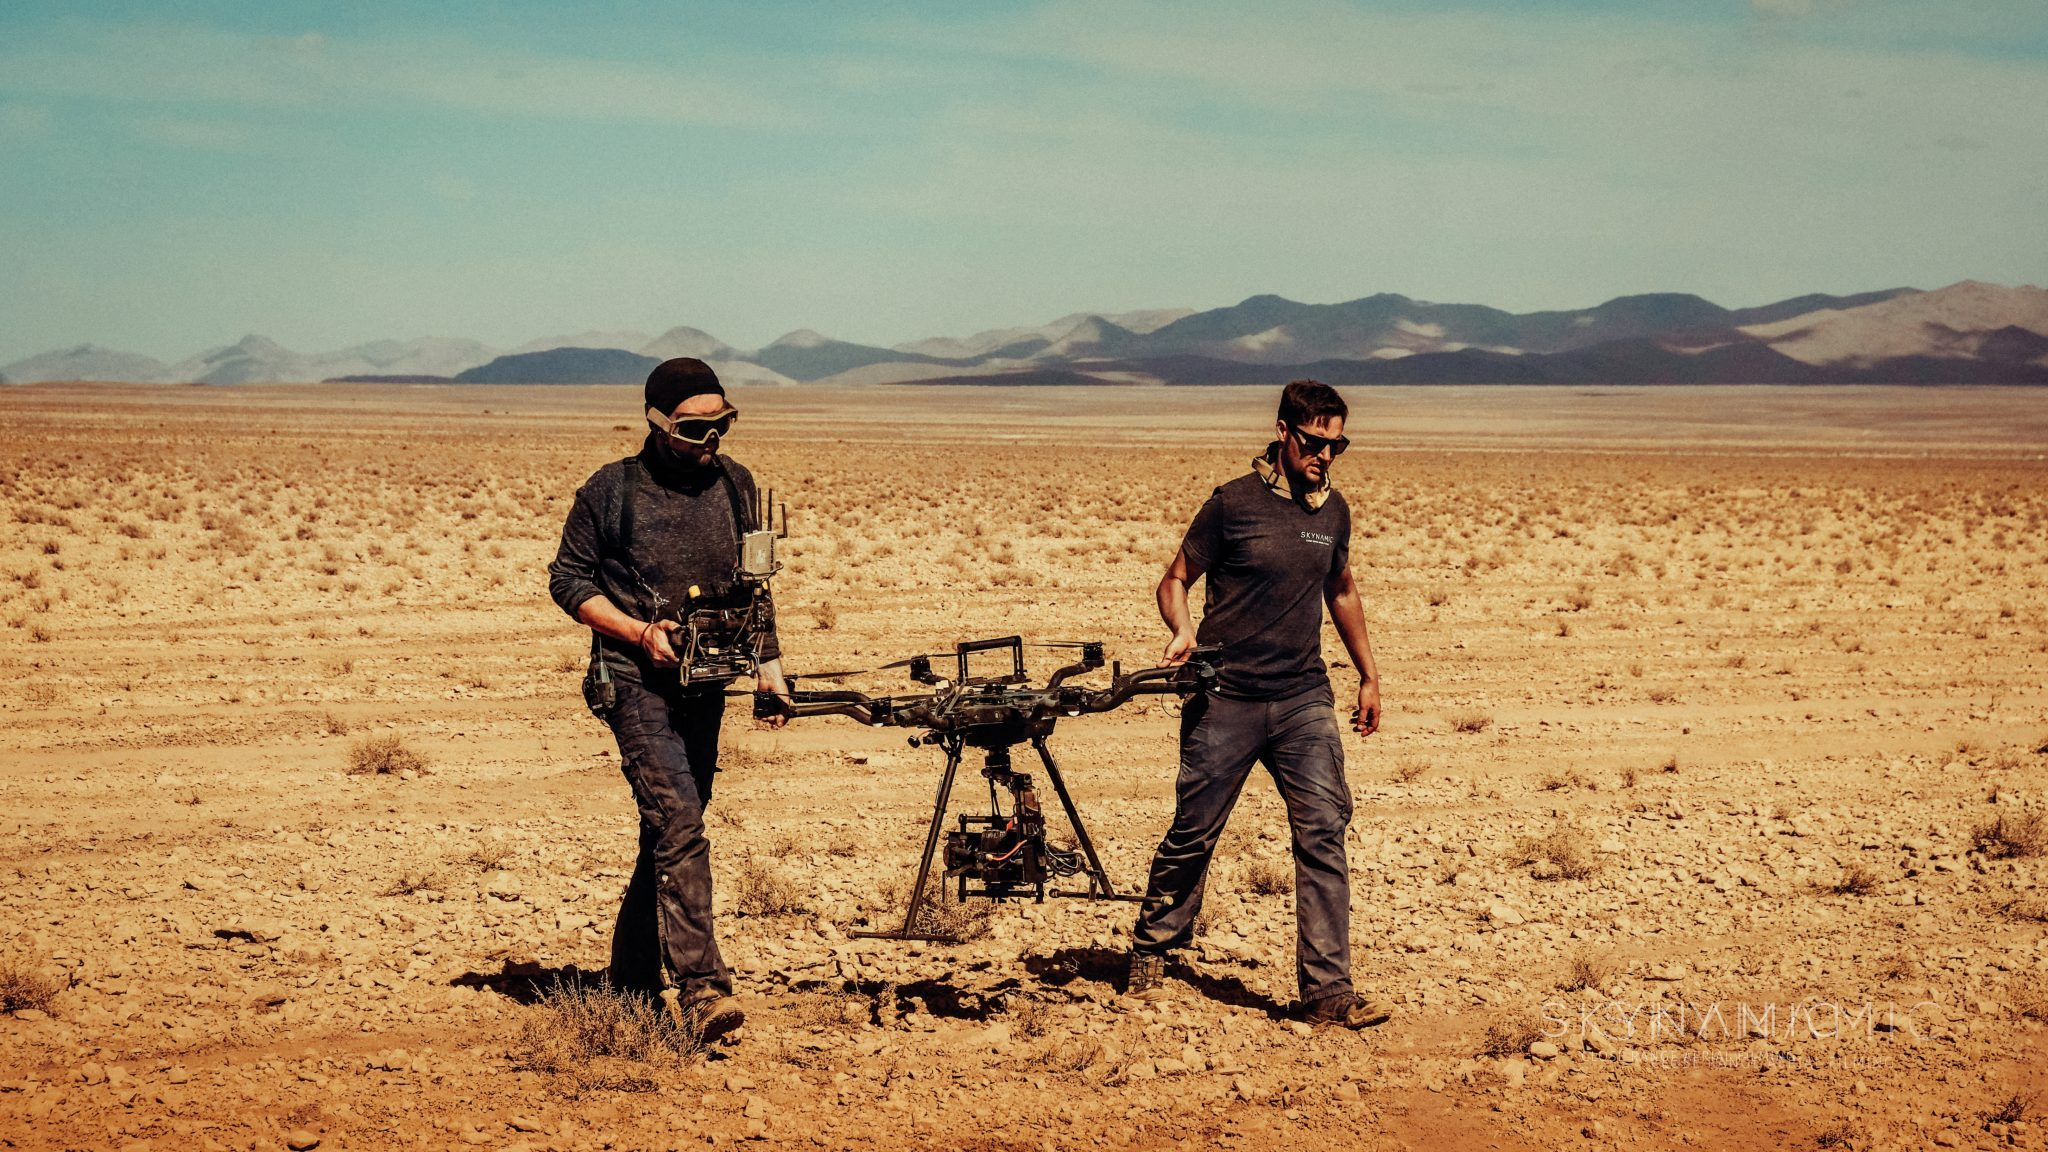 Alexa Mini Drohne Marokko